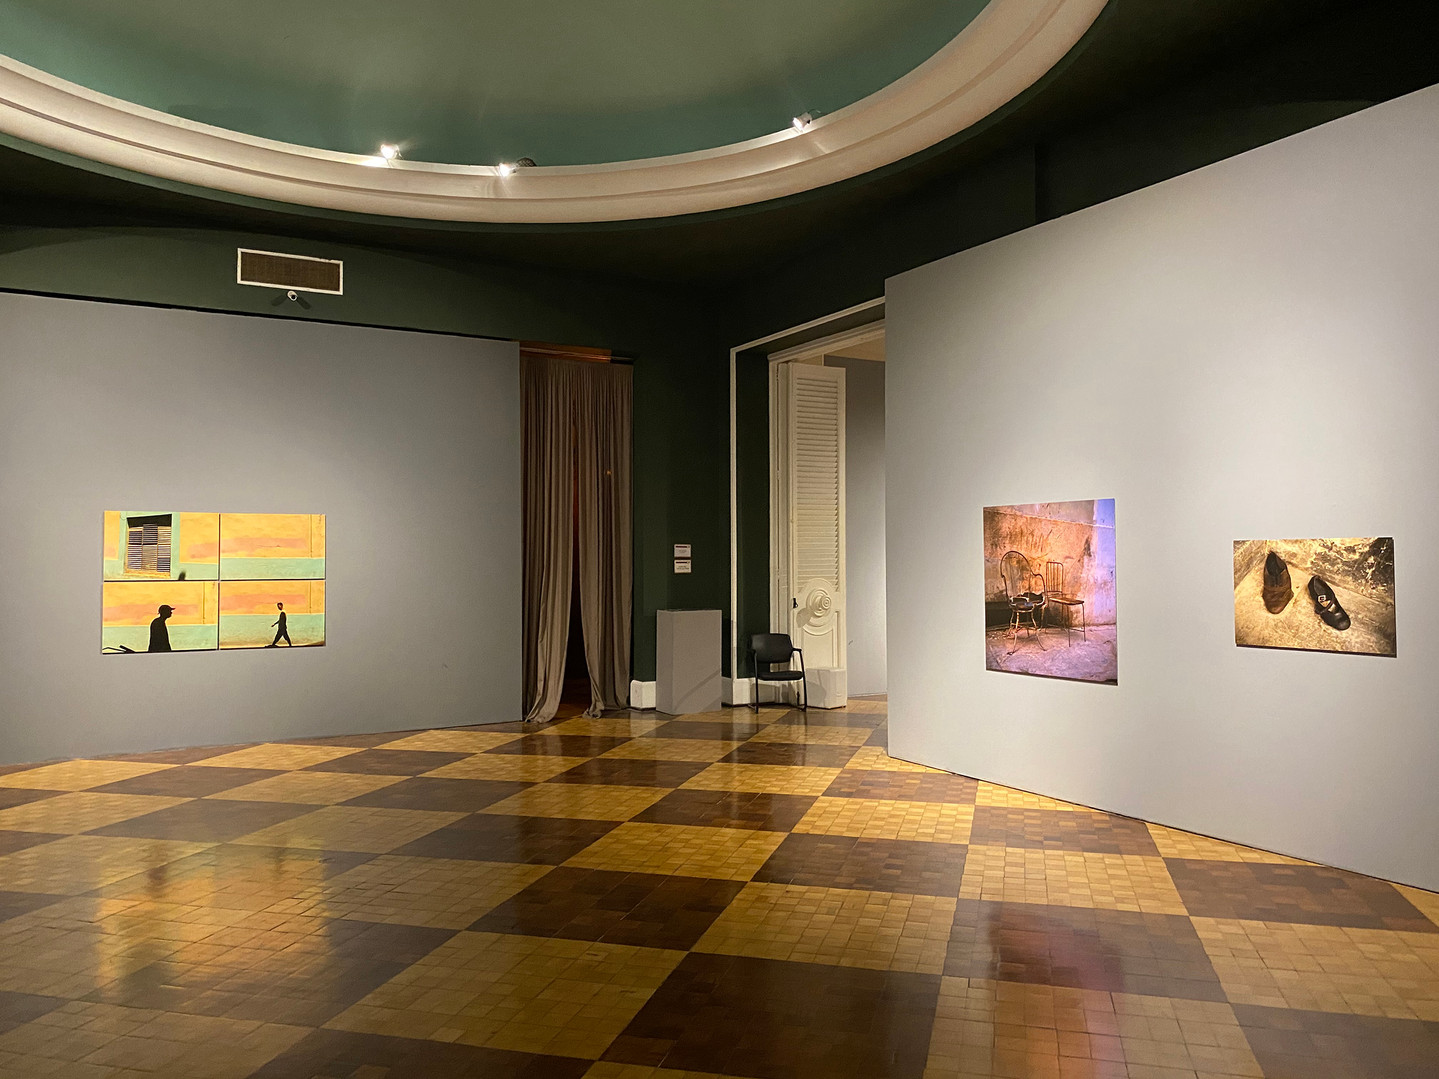 Exposition 'Habaneras' 2019, SESC Quitandinha, Brazil. Miguel Rio Branco and Isidora Gajic